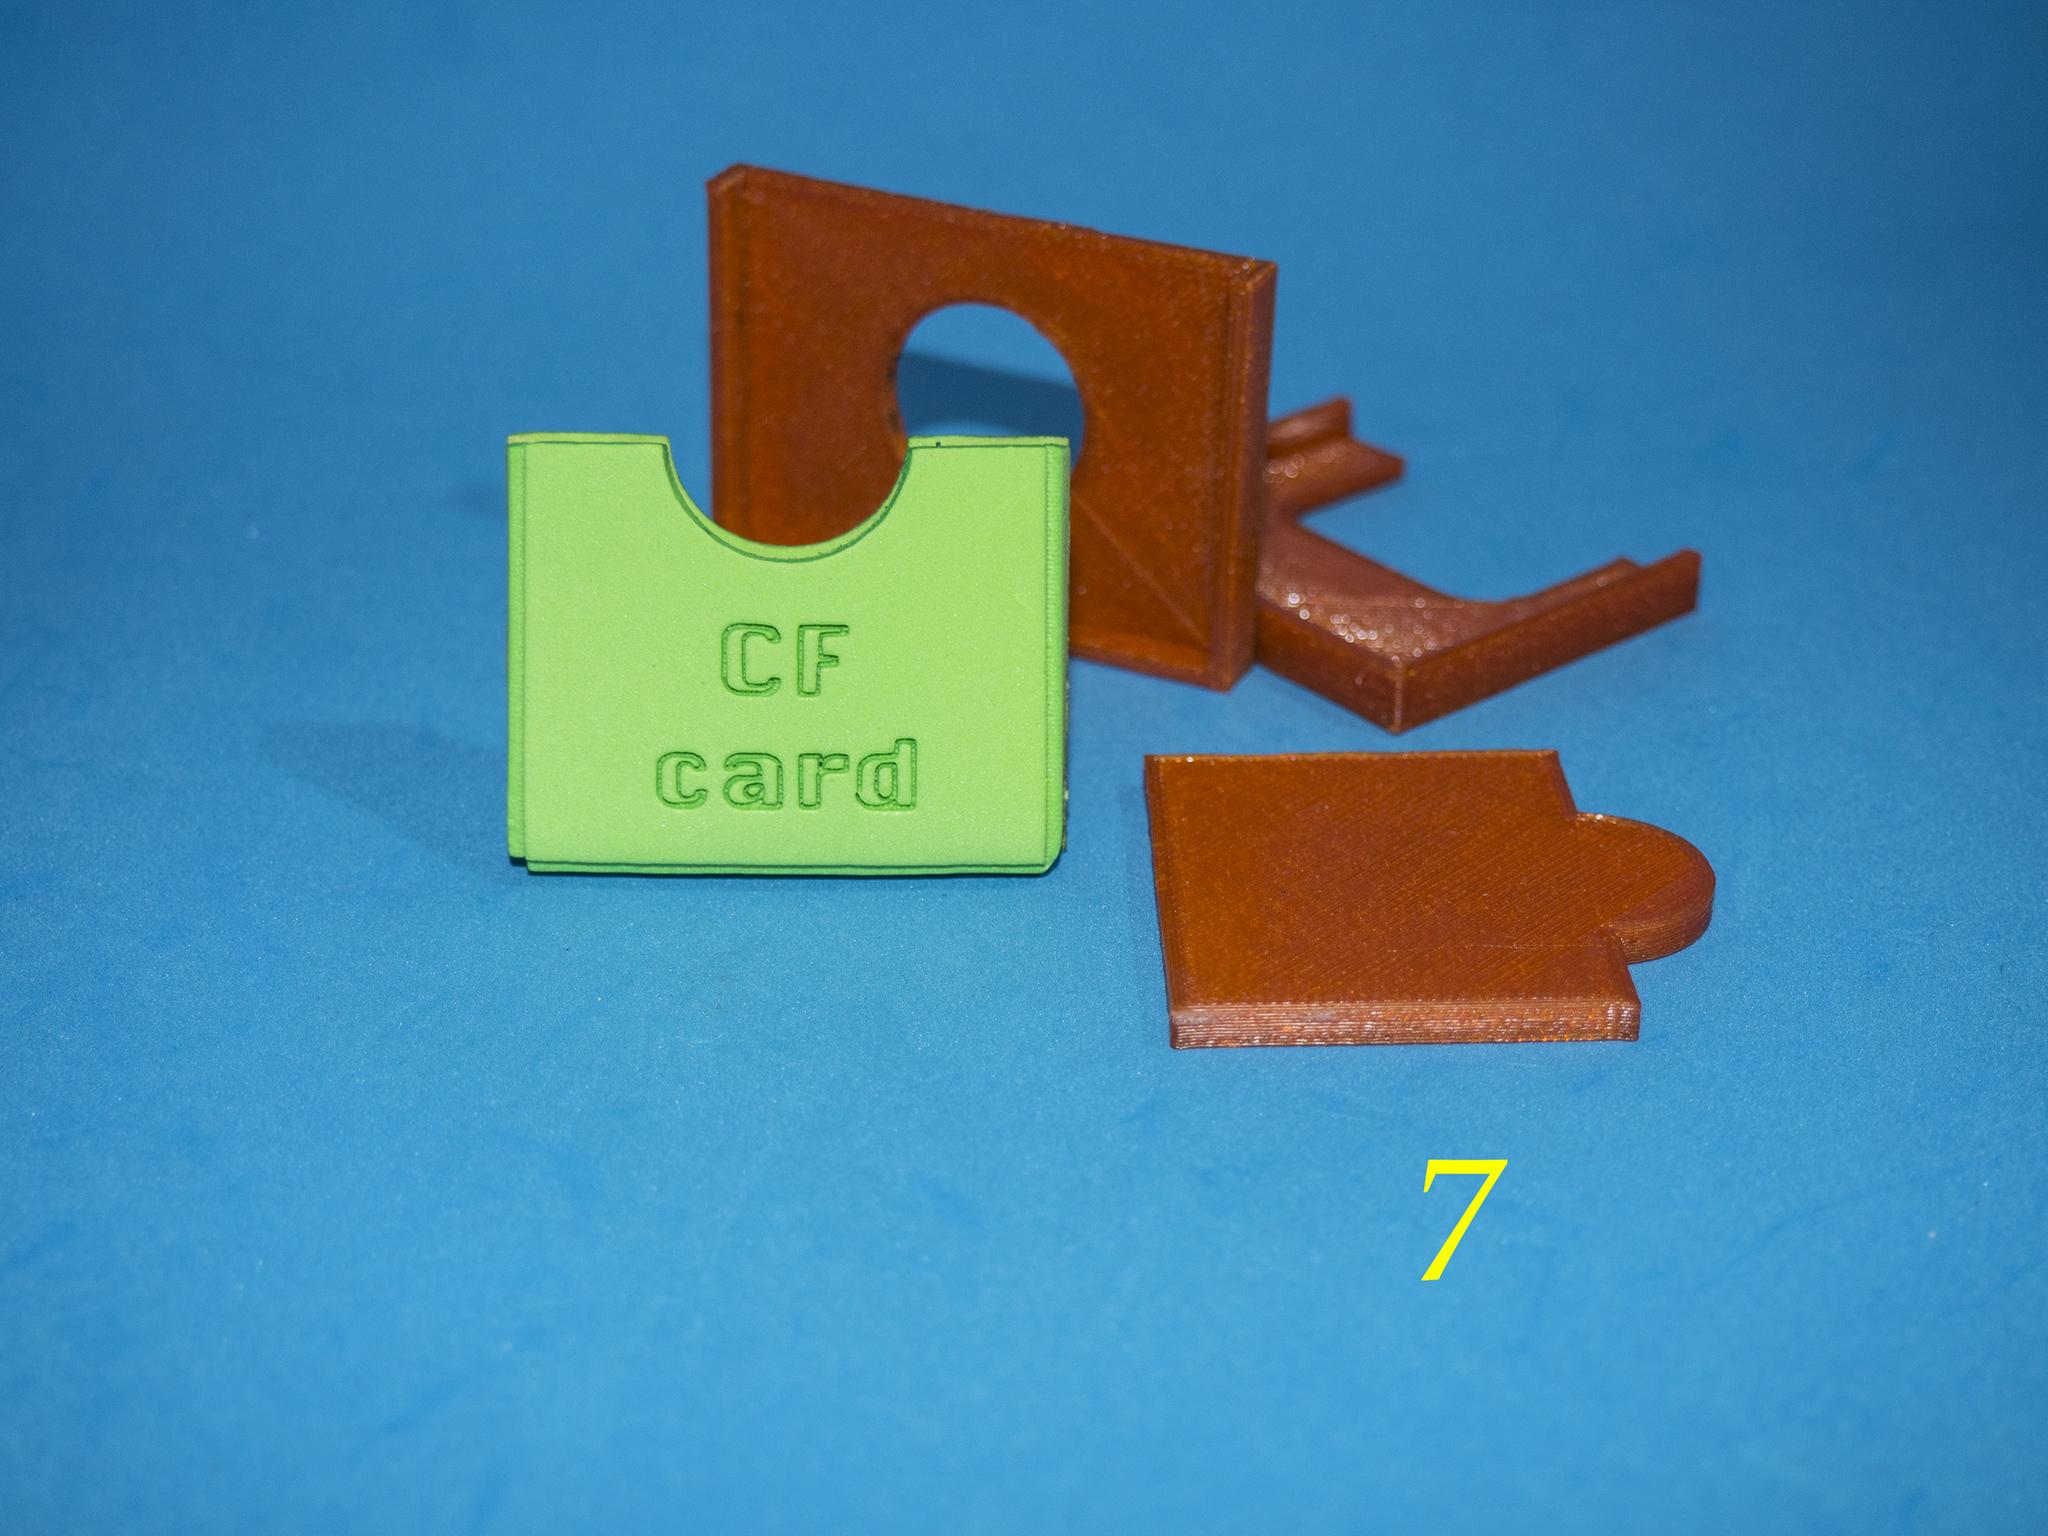 8.jpg Download free STL file Lasercut EVA foam CF Card sleeve + gluing jig • 3D printing template, dancingchicken